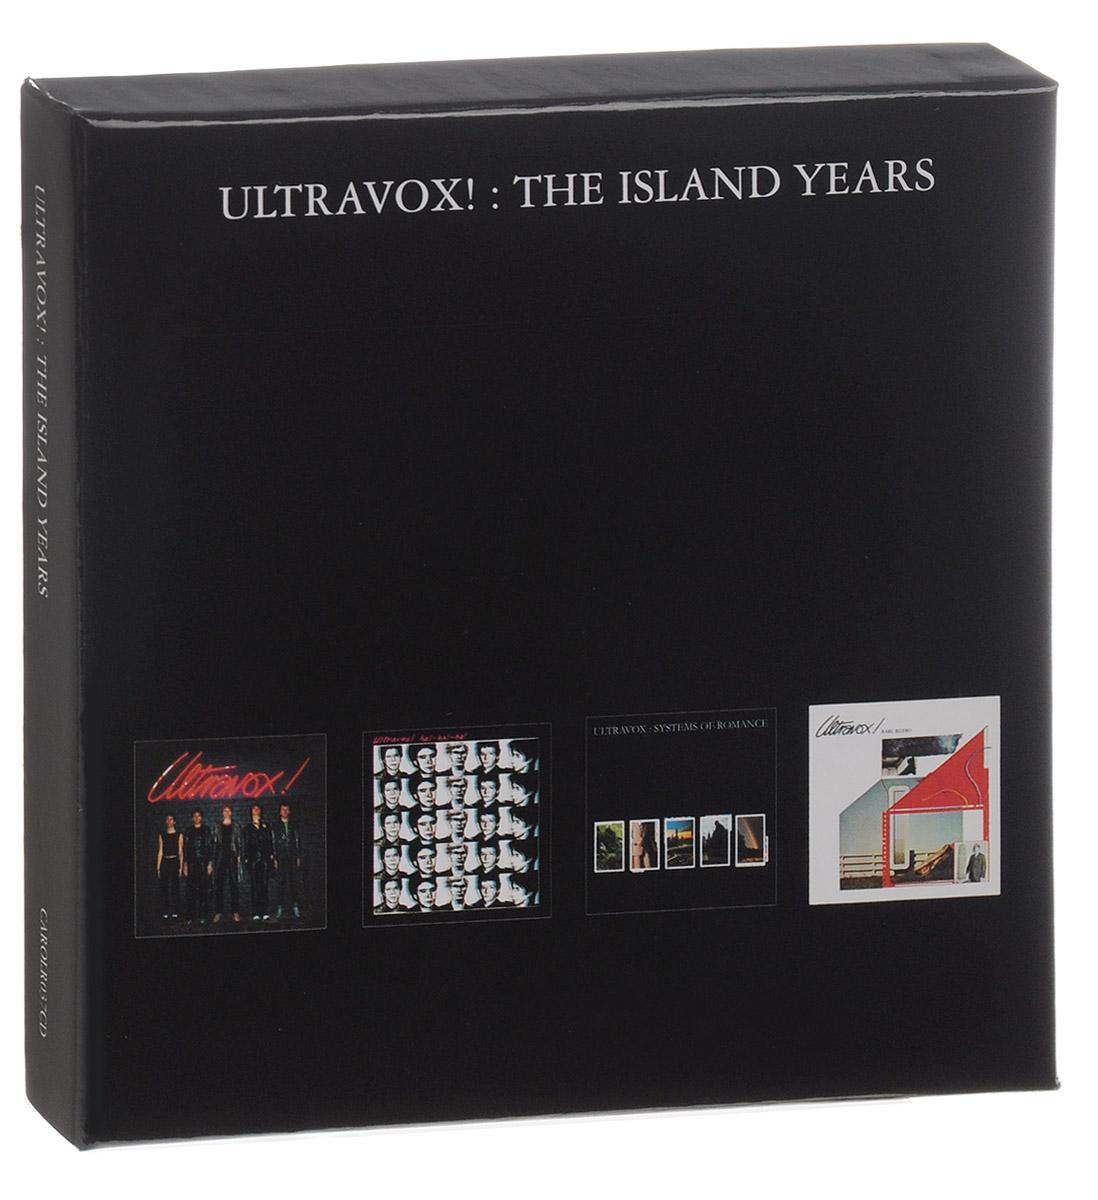 Ultravox Ultravox! The Island Albums (4 CD) ultravox ultravox systems of romance